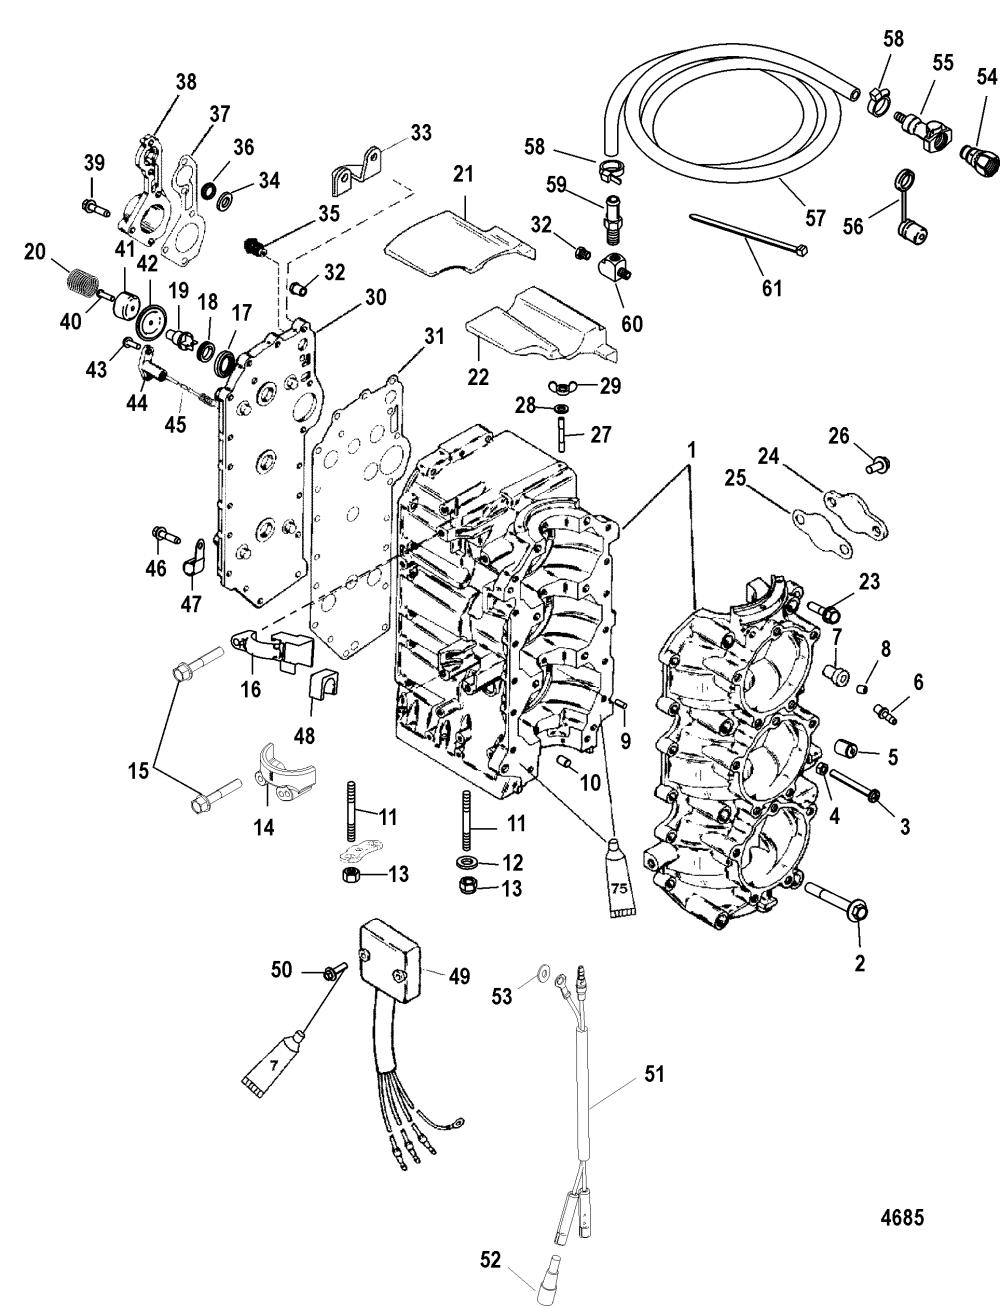 medium resolution of cylinder block for mariner mercury 75 90 hp 65 jet 3 cylinder diagram of 2006 mercury marine mercury outboard 1090412fb electrical